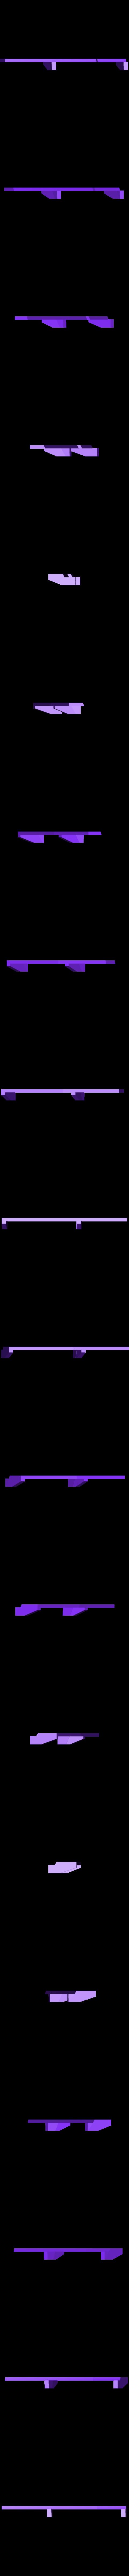 MirrorRun_Board_Front-B.STL Download free STL file 4-8-8-4 Big Boy Locomotive • 3D printer object, RaymondDeLuca